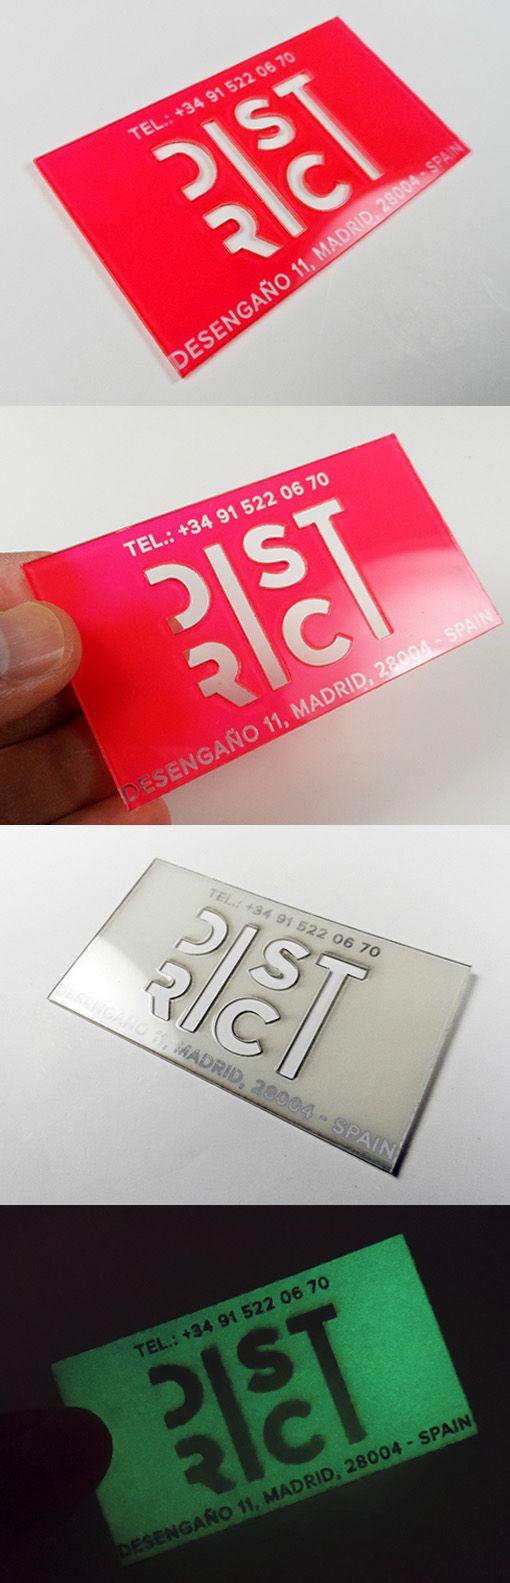 Amazing Glow In The Dark Laser Cut Plastic Business Card Design ...